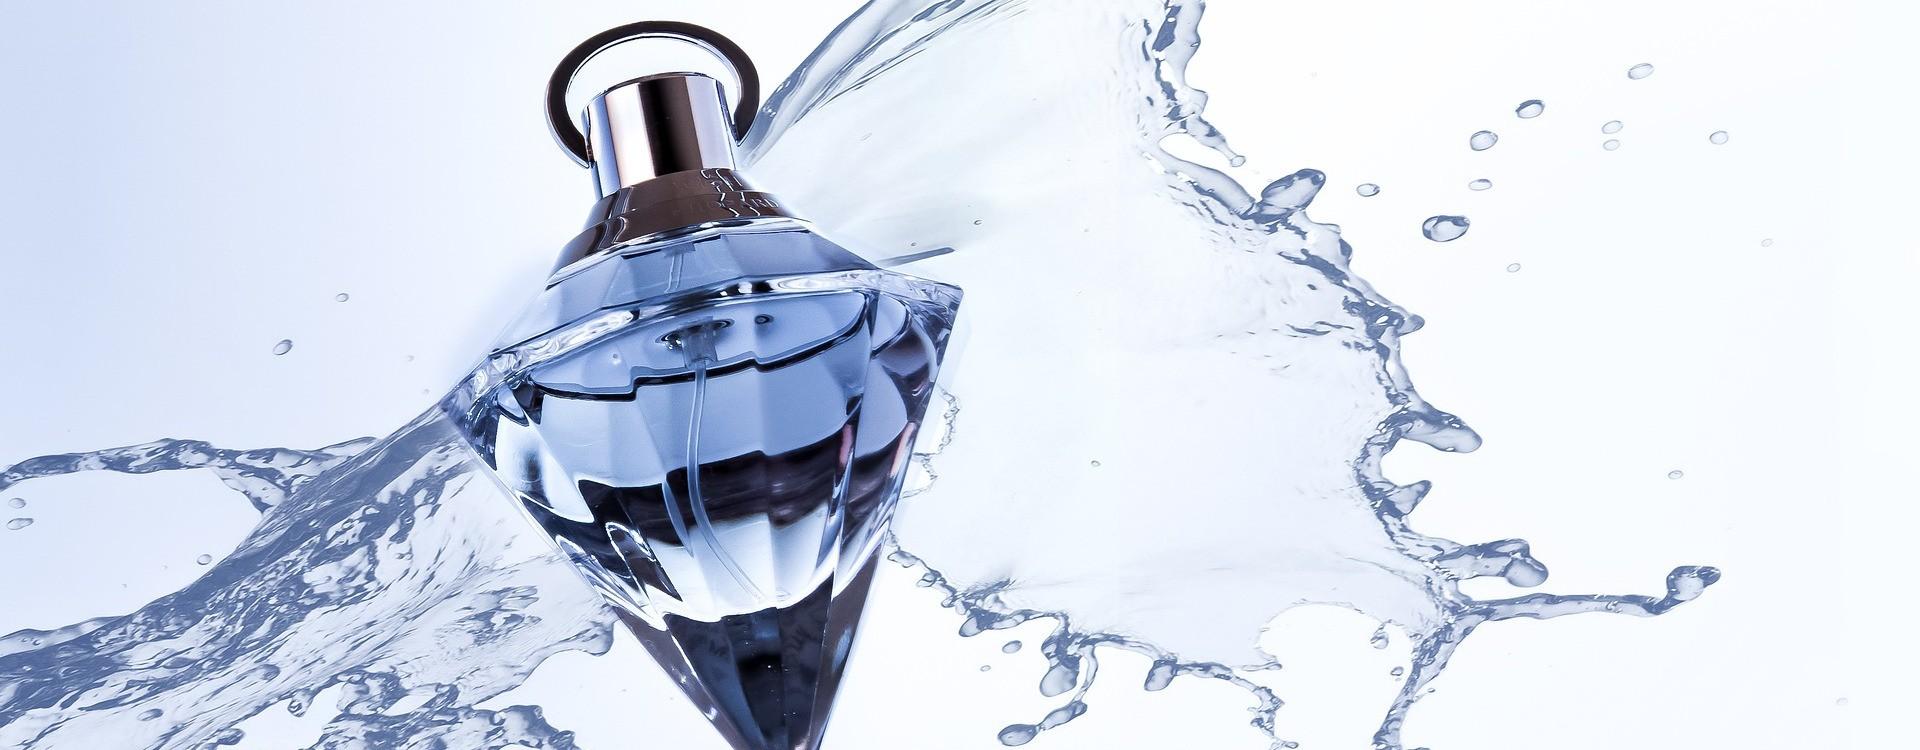 Popularna seria perfum Beyonce - oceniamy i polecamy